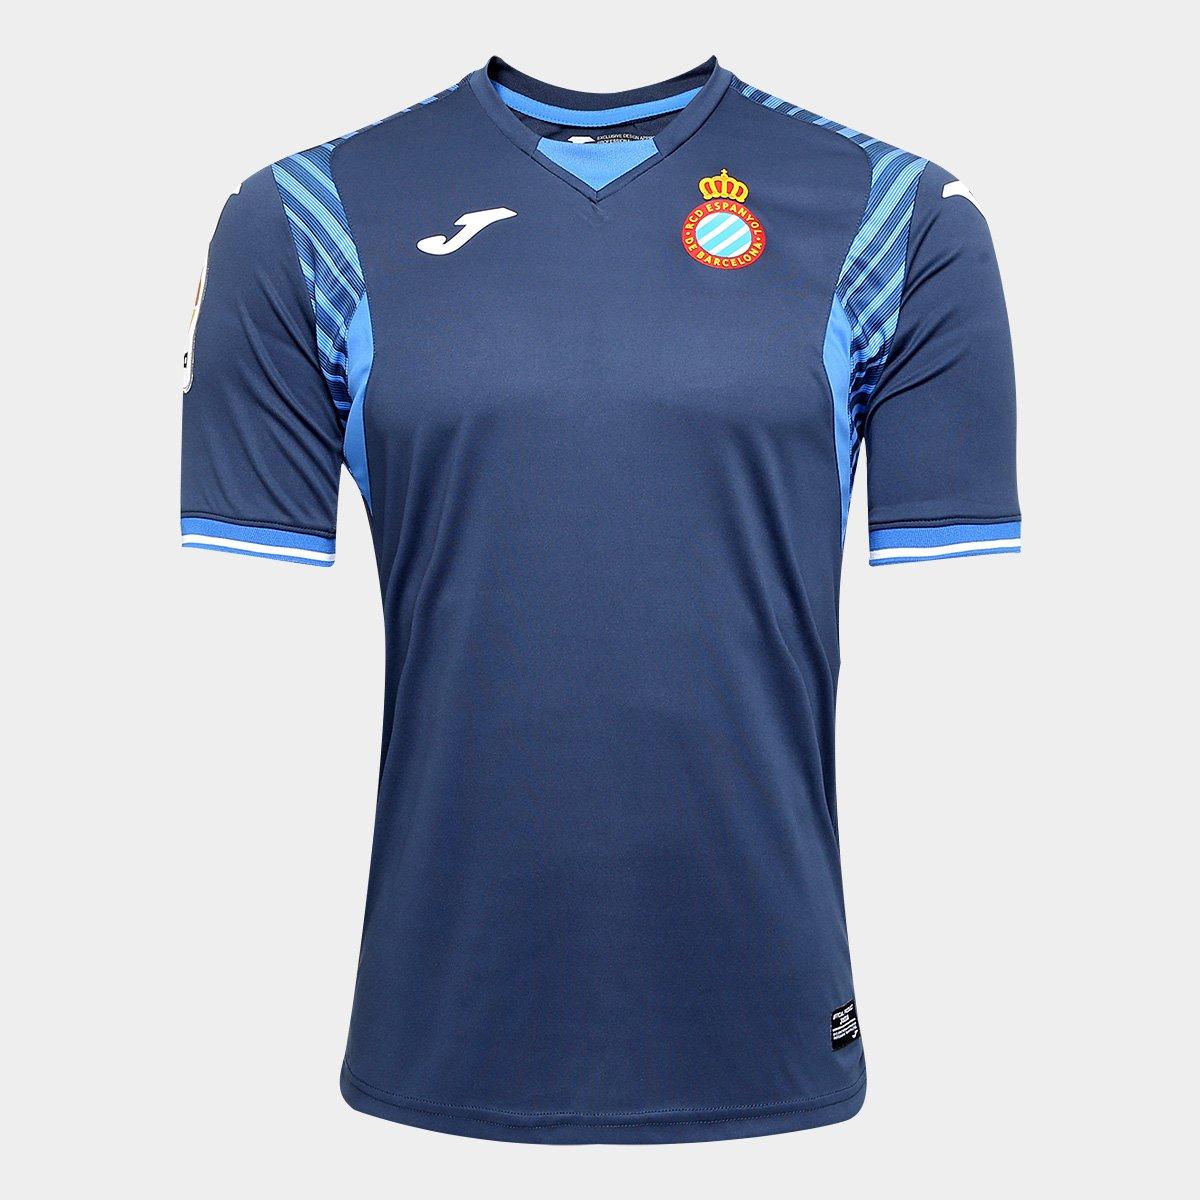 Camisa Espanyol Away 17 18 s n°- Torcedor Joma Masculina c74bee06ccf05